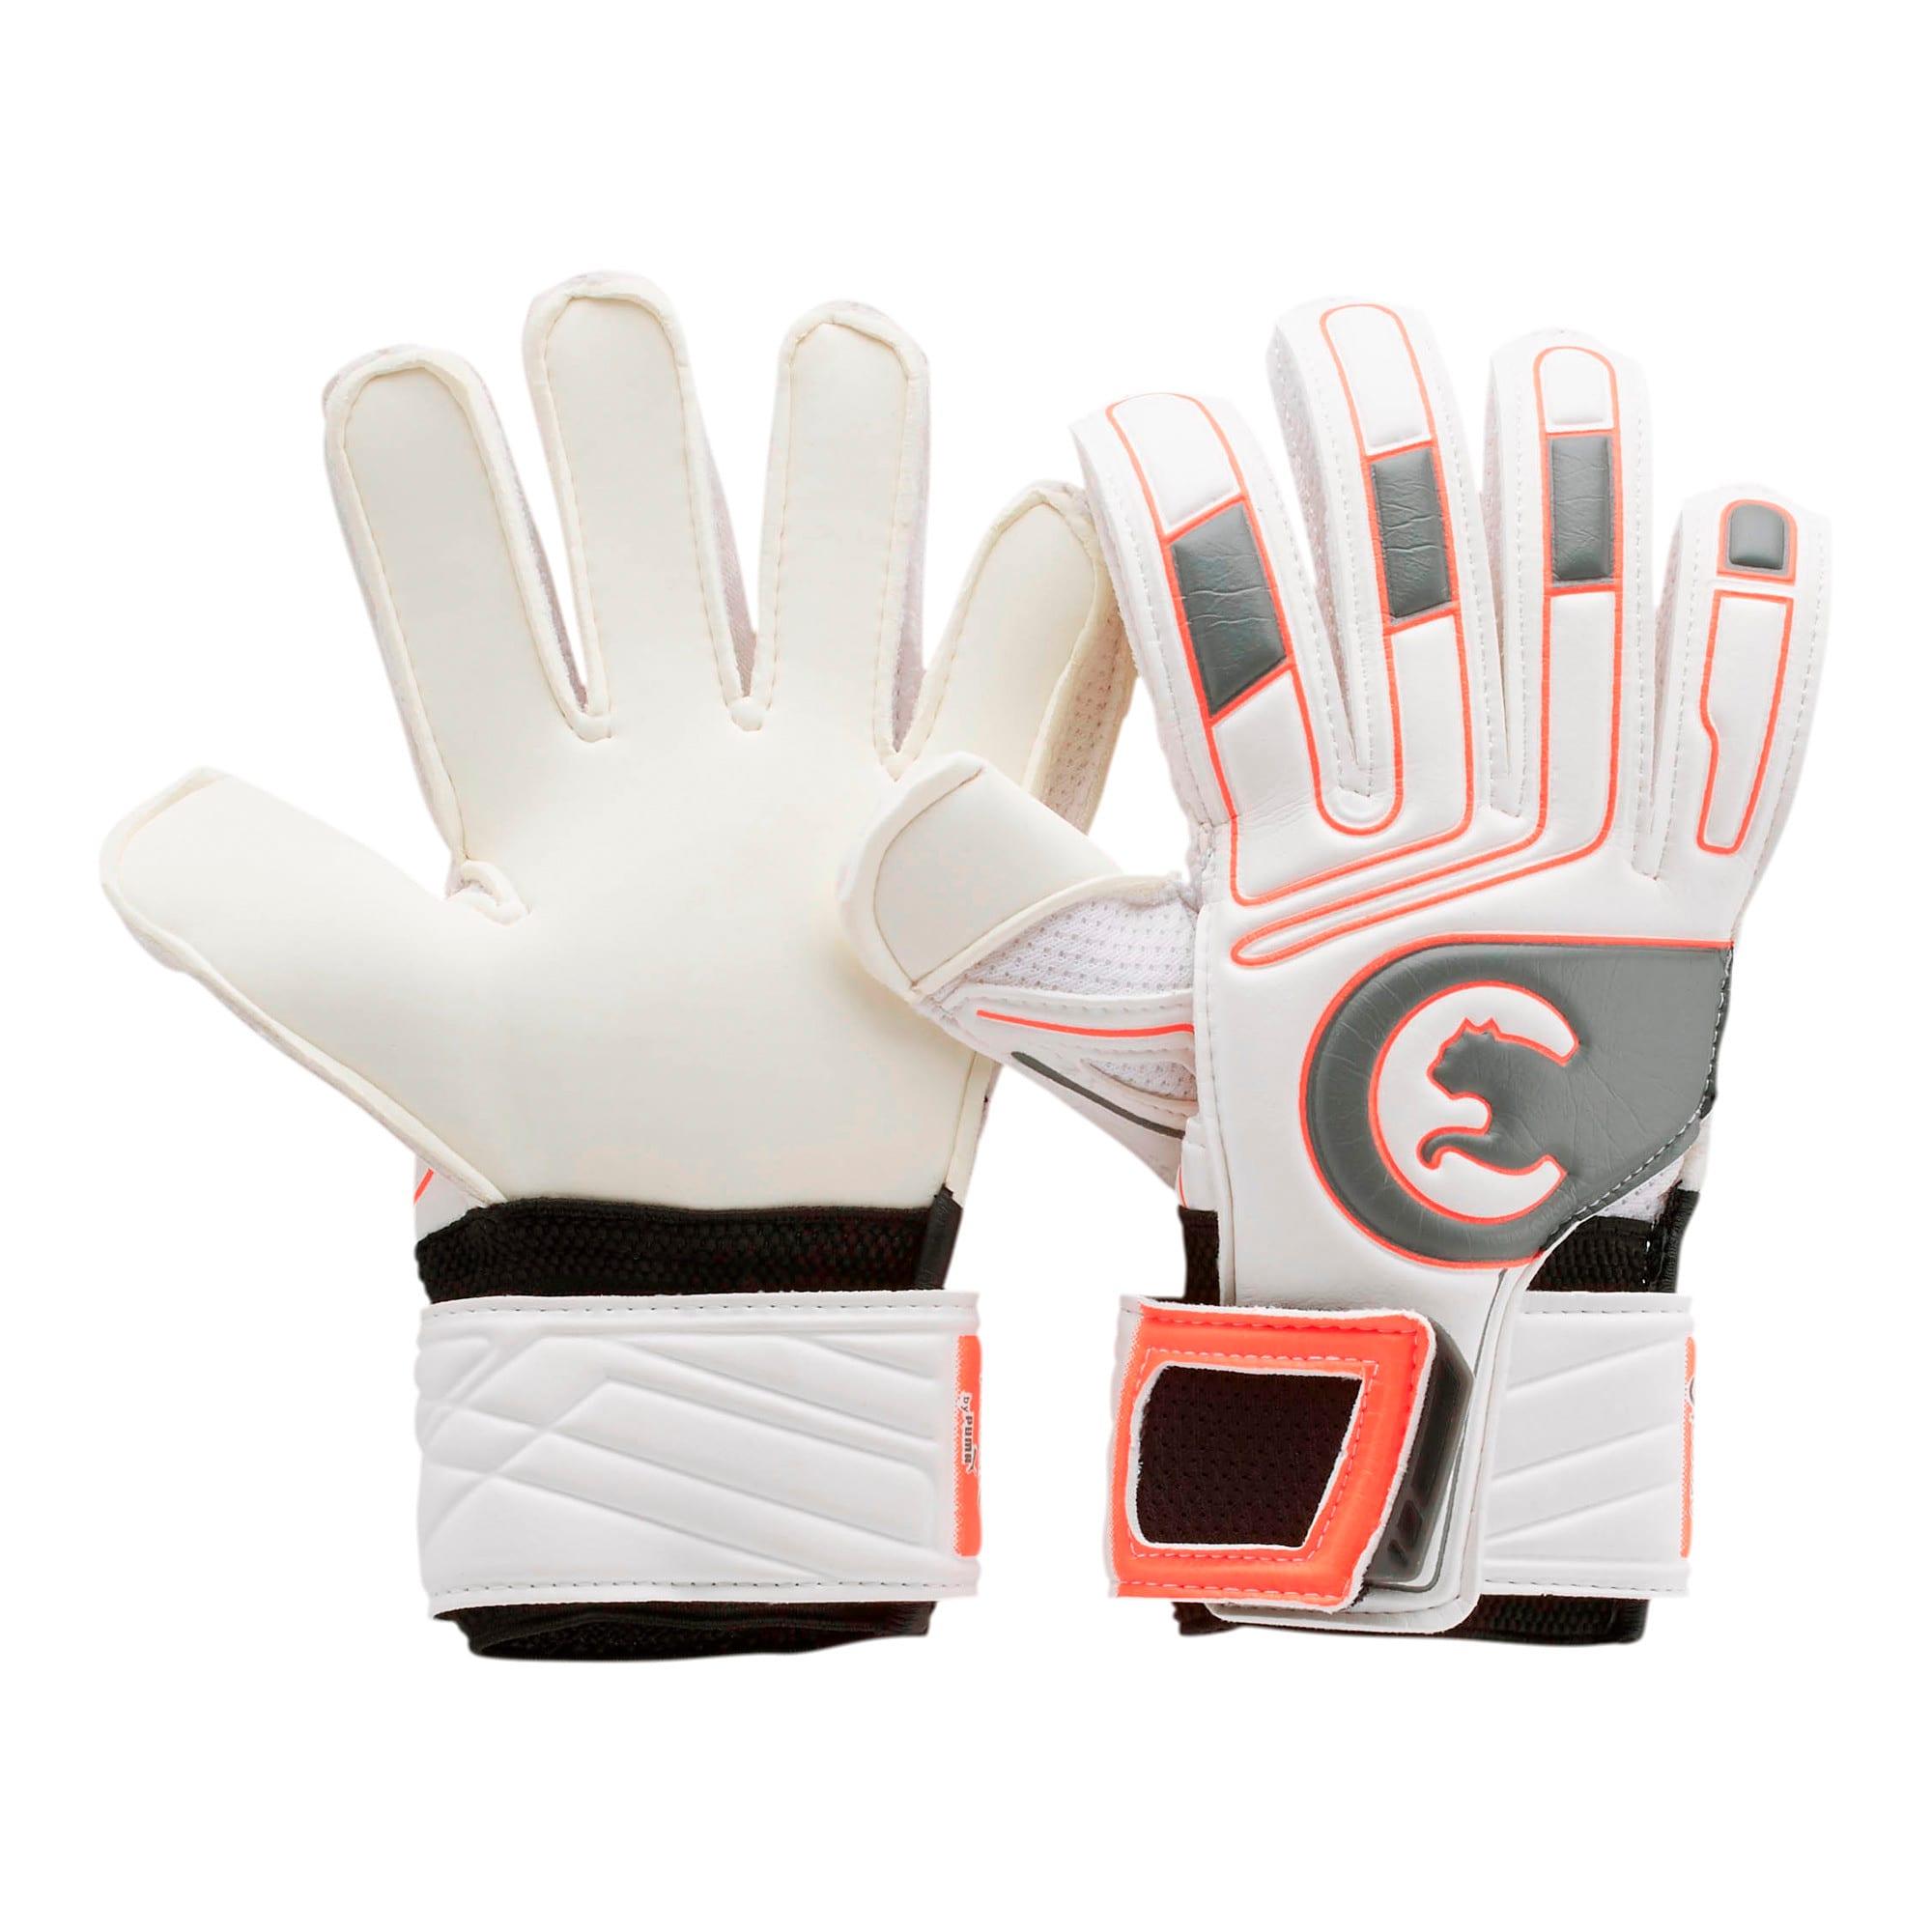 Thumbnail 1 of ProCat Scoreline 2.0 Little Kids' Gloves, BLACK, medium